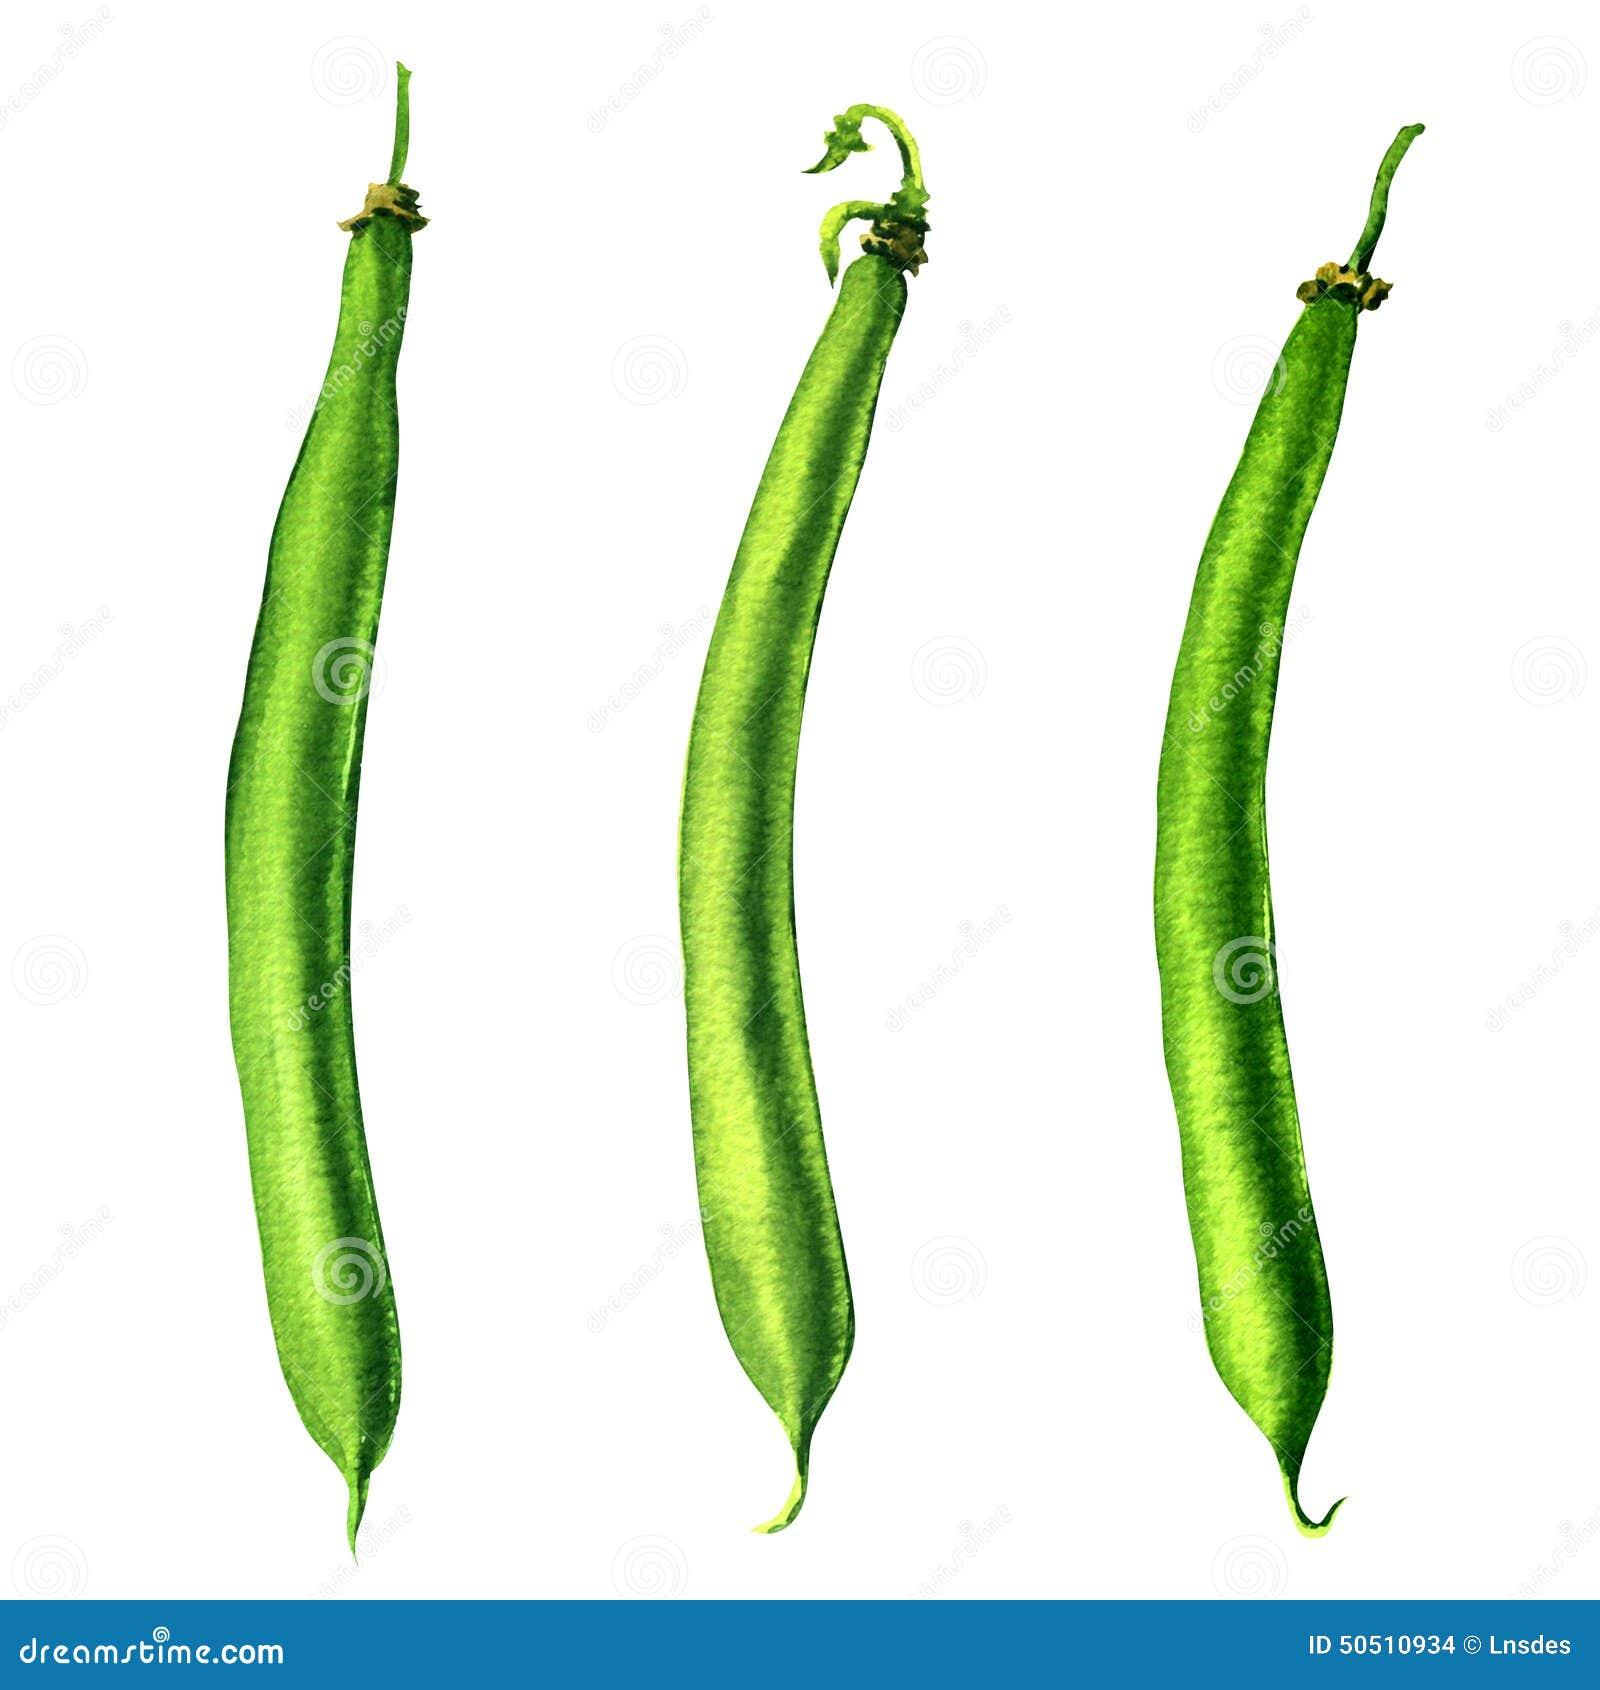 Green Beans On White Background Stock Illustration - Image: 50510934